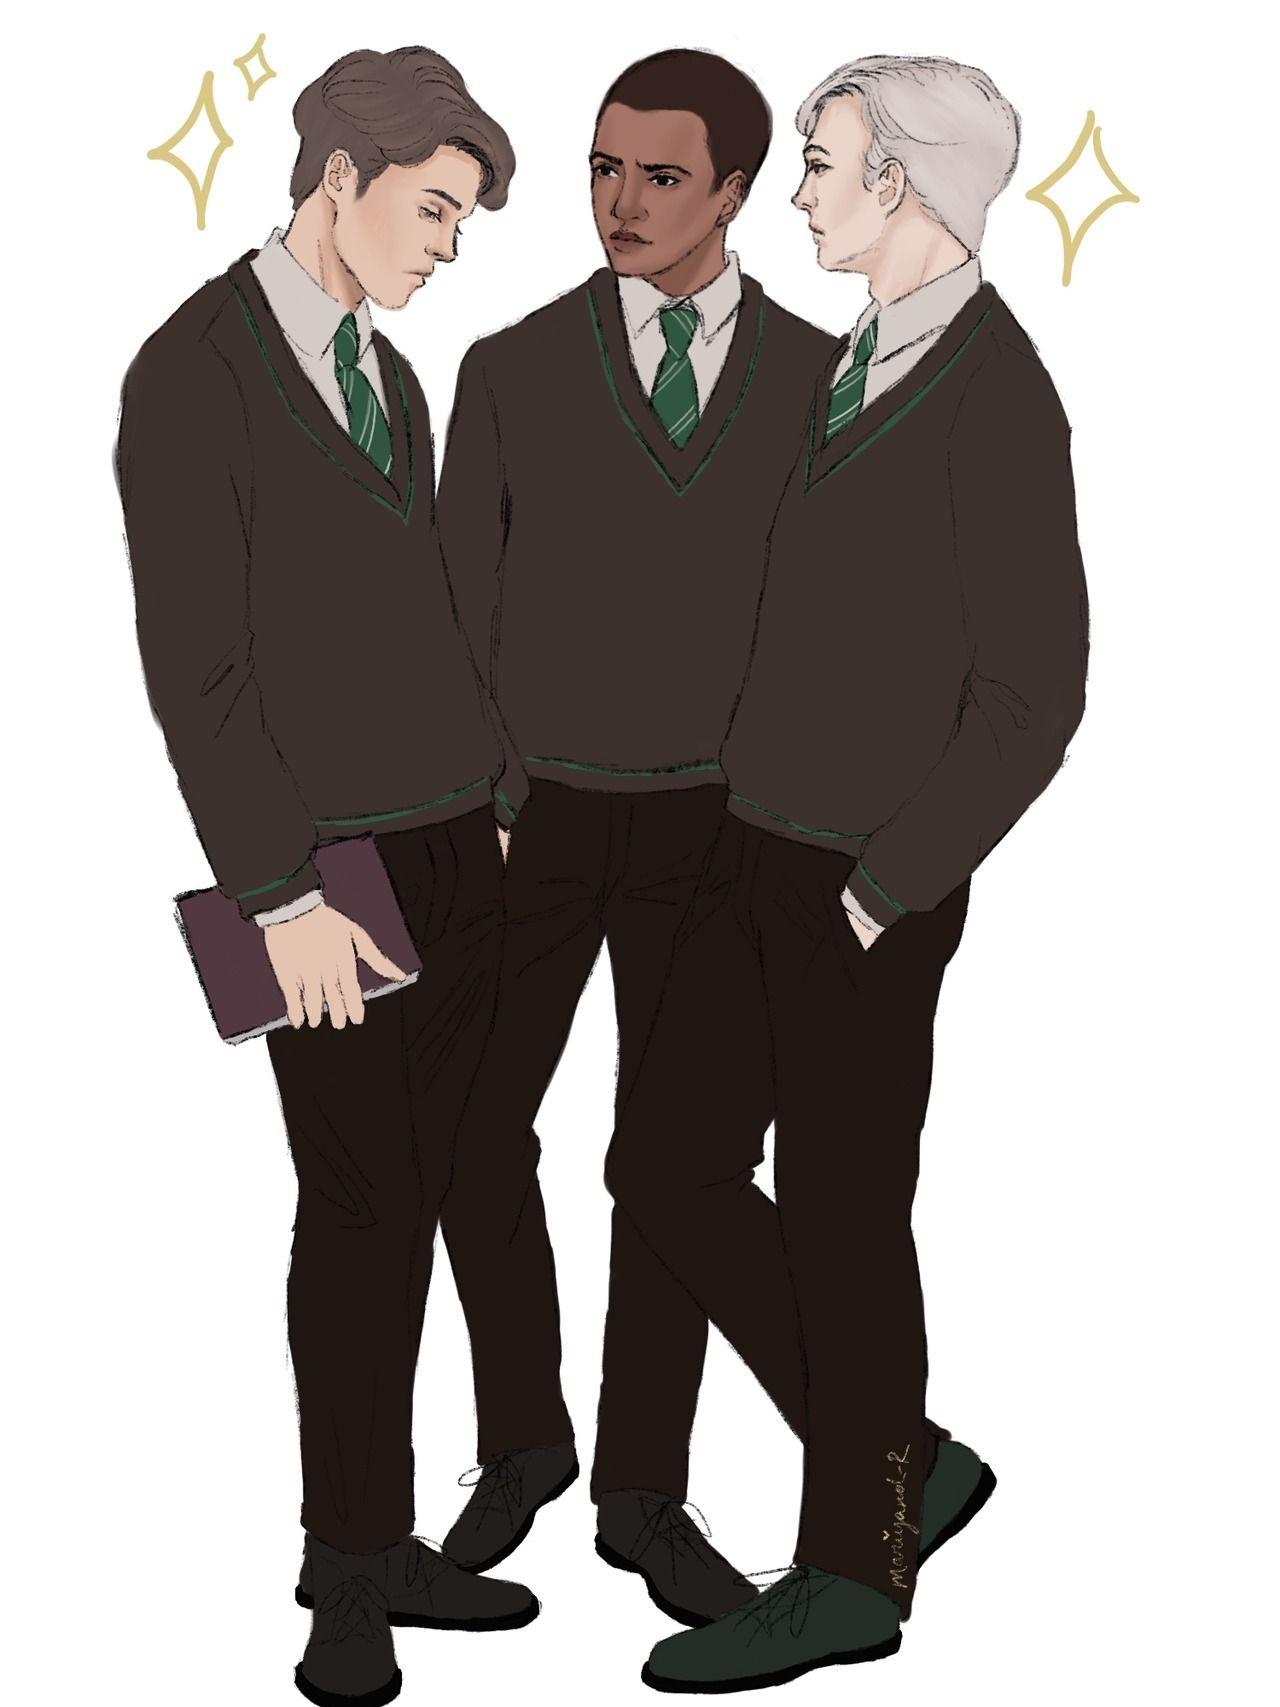 Slytherins We Play To Win Theo Nott Blaise Zabini Draco Malfoy Harry Potter Artwork Harry Potter Painting Harry Potter Fan Art